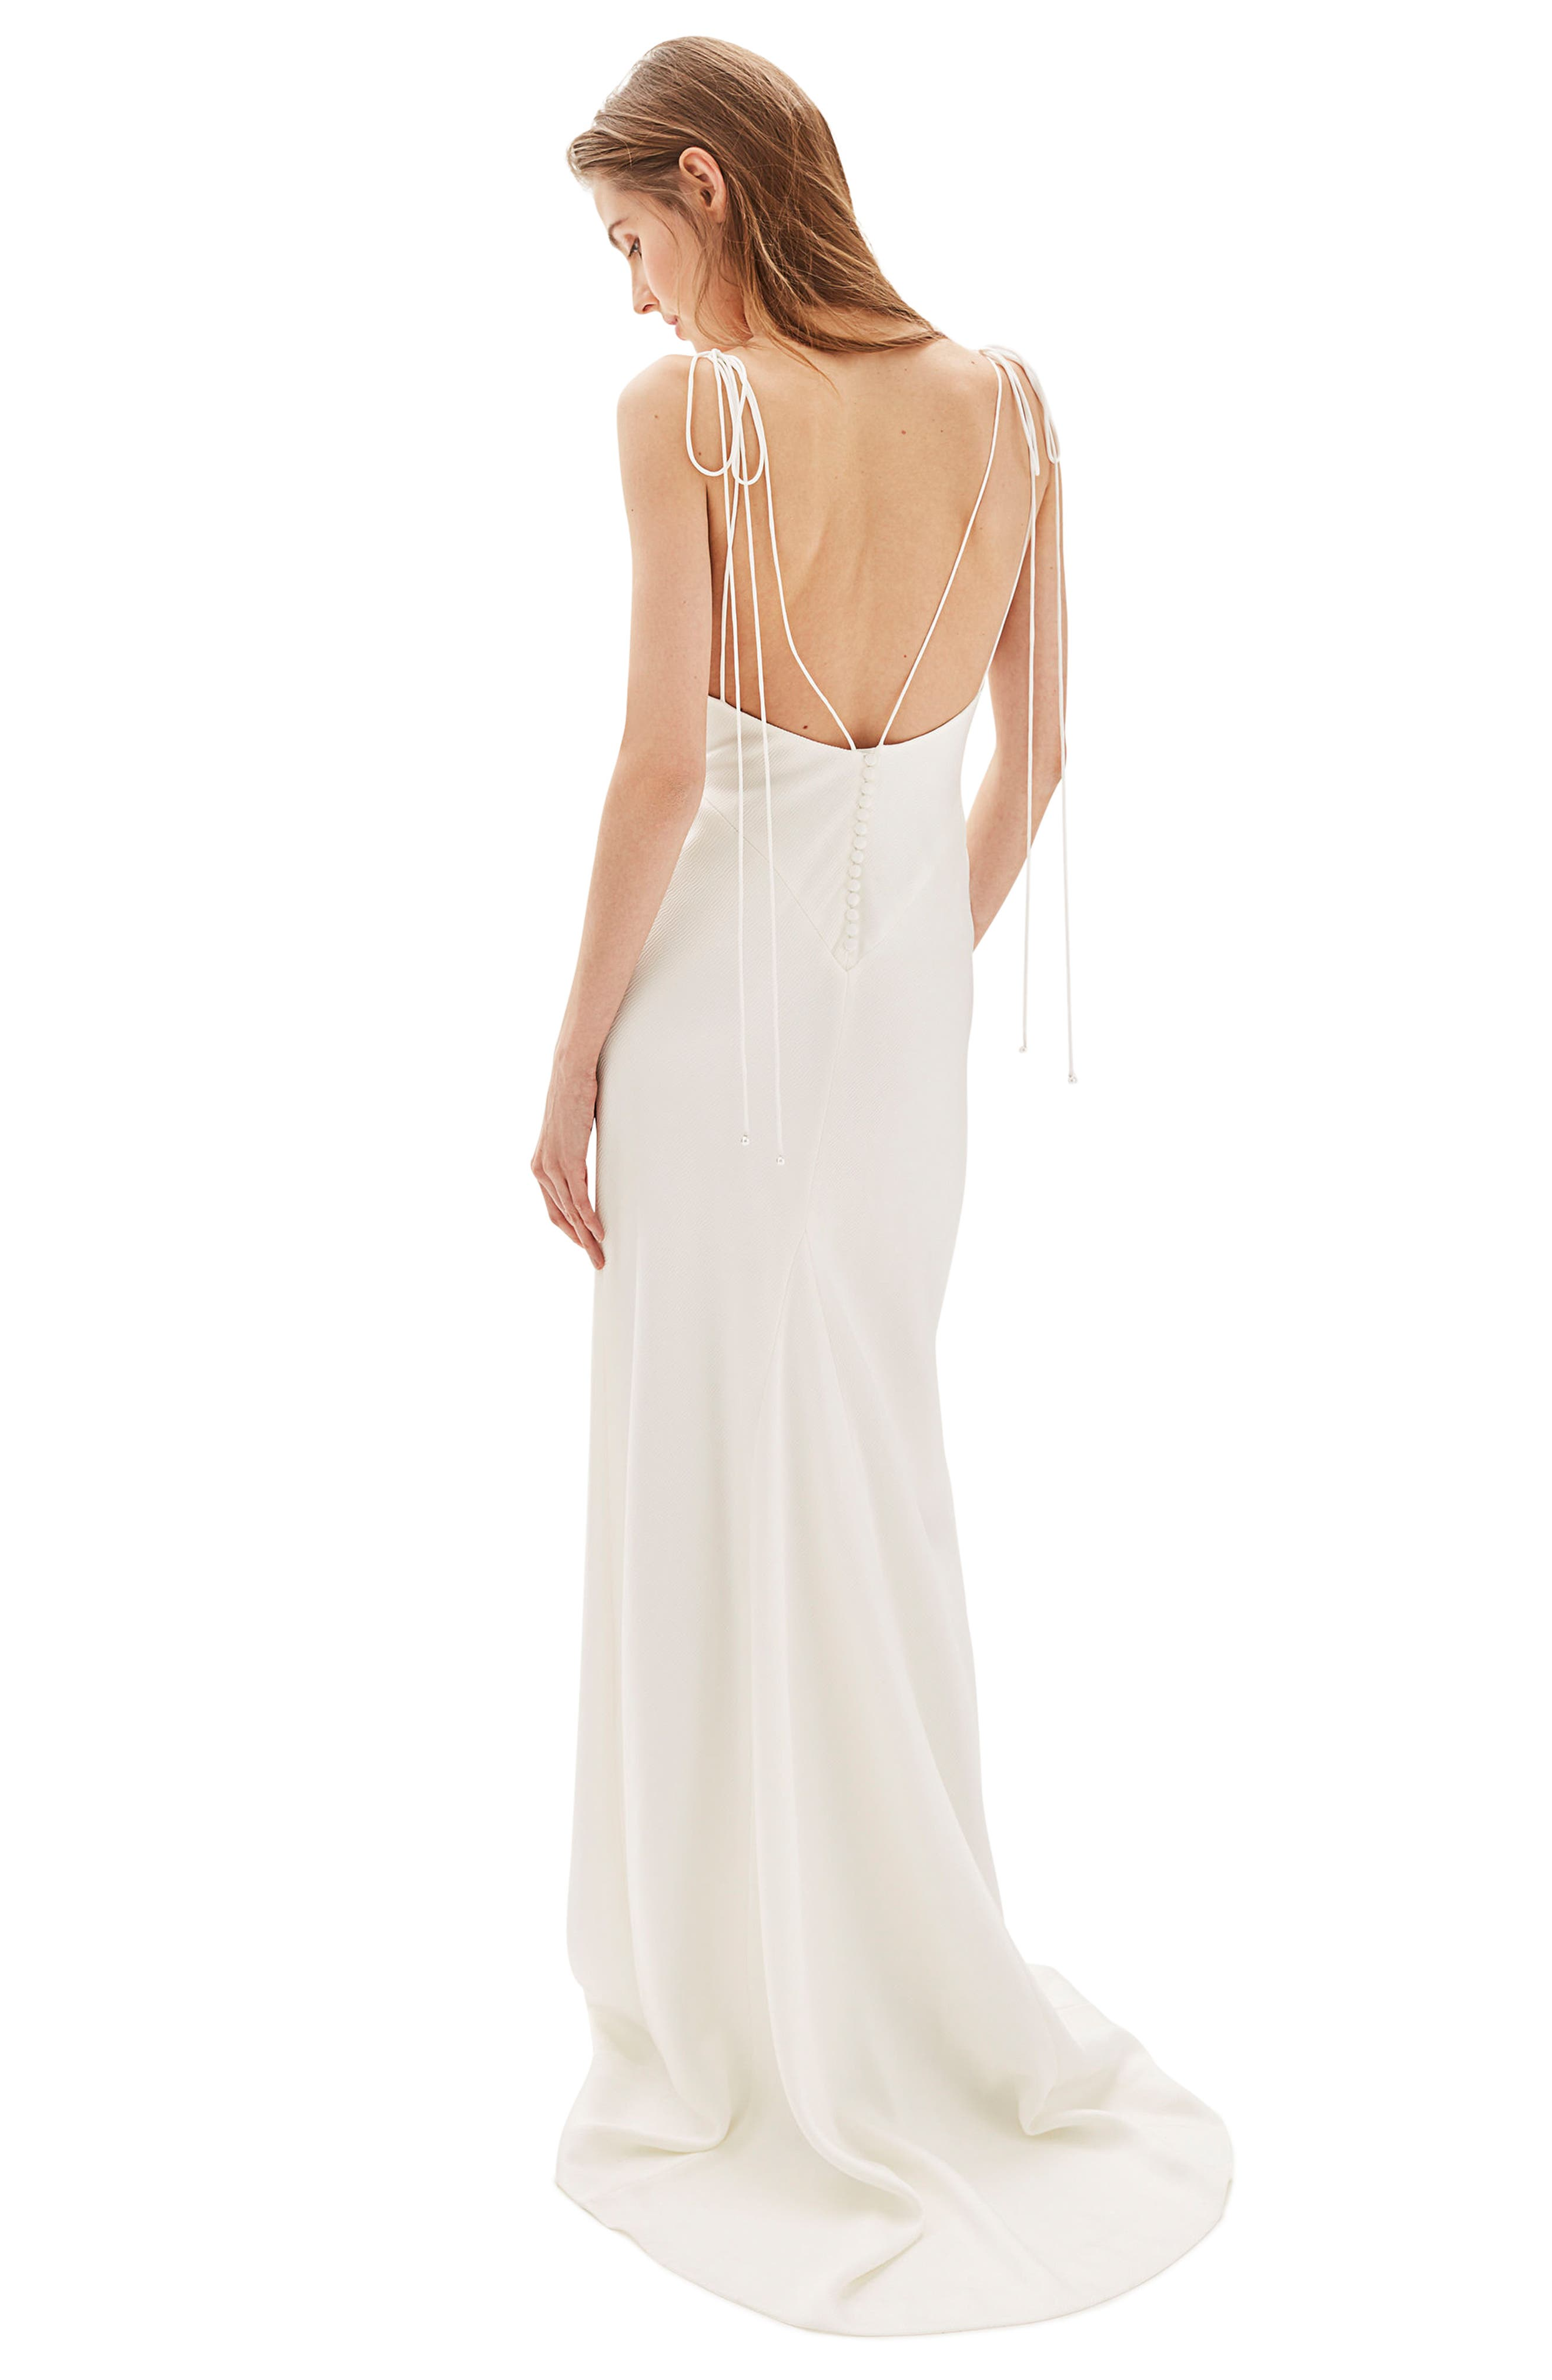 Bride V-Neck Satin Sheath Gown,                             Alternate thumbnail 2, color,                             900